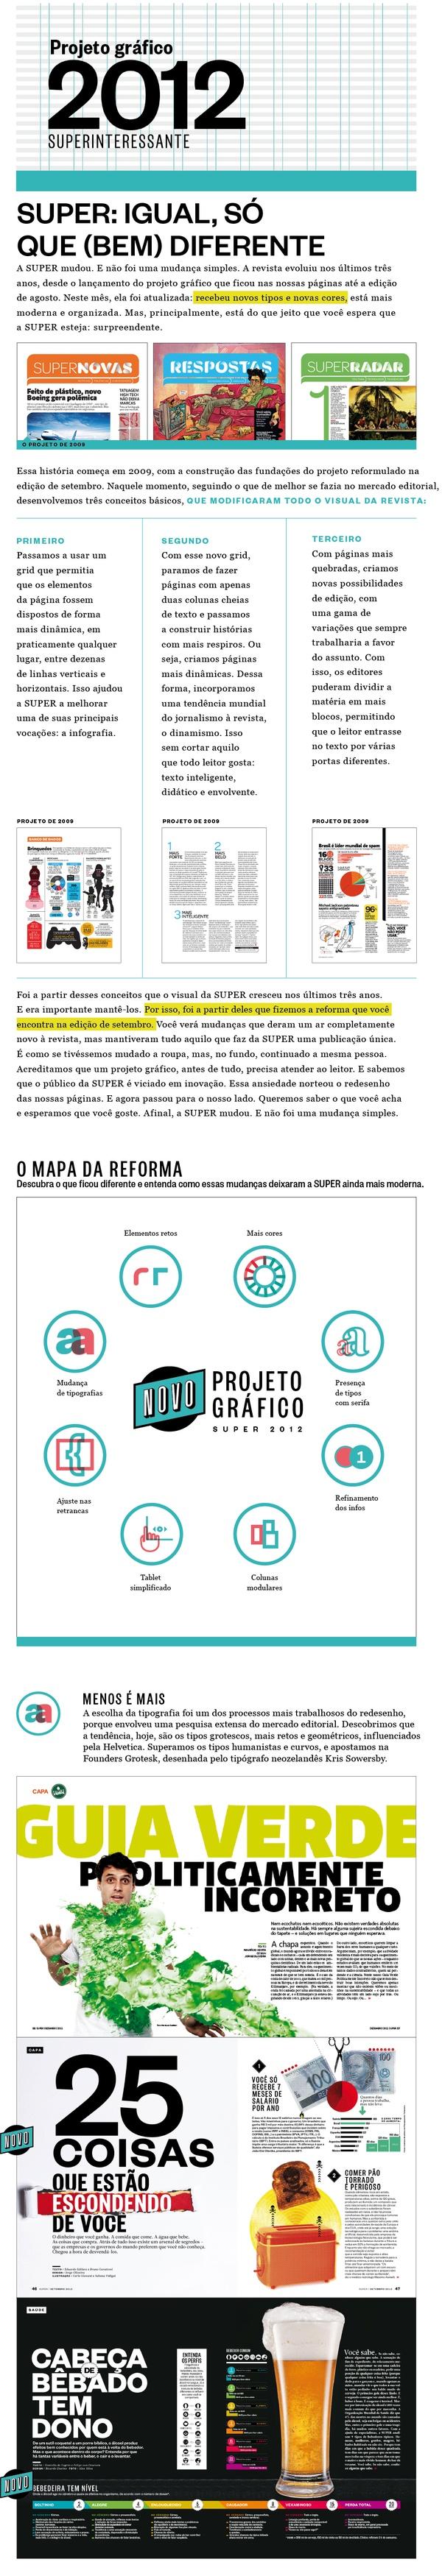 Projeto gráfico - Super 2012 by Jorge Oliveira, via Behance